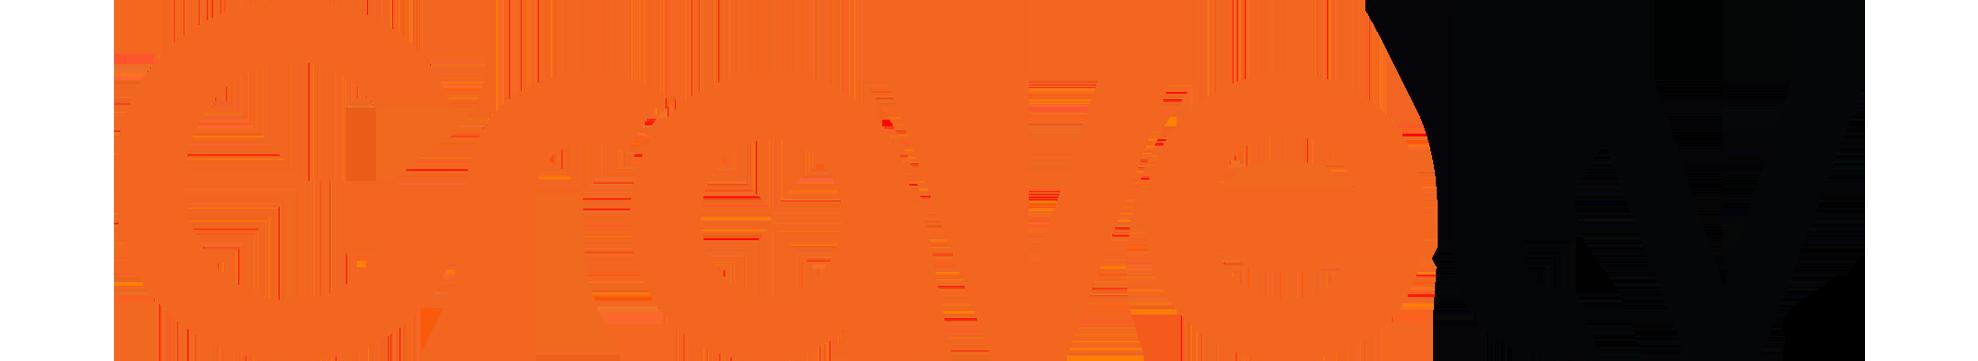 Cravetv1.png